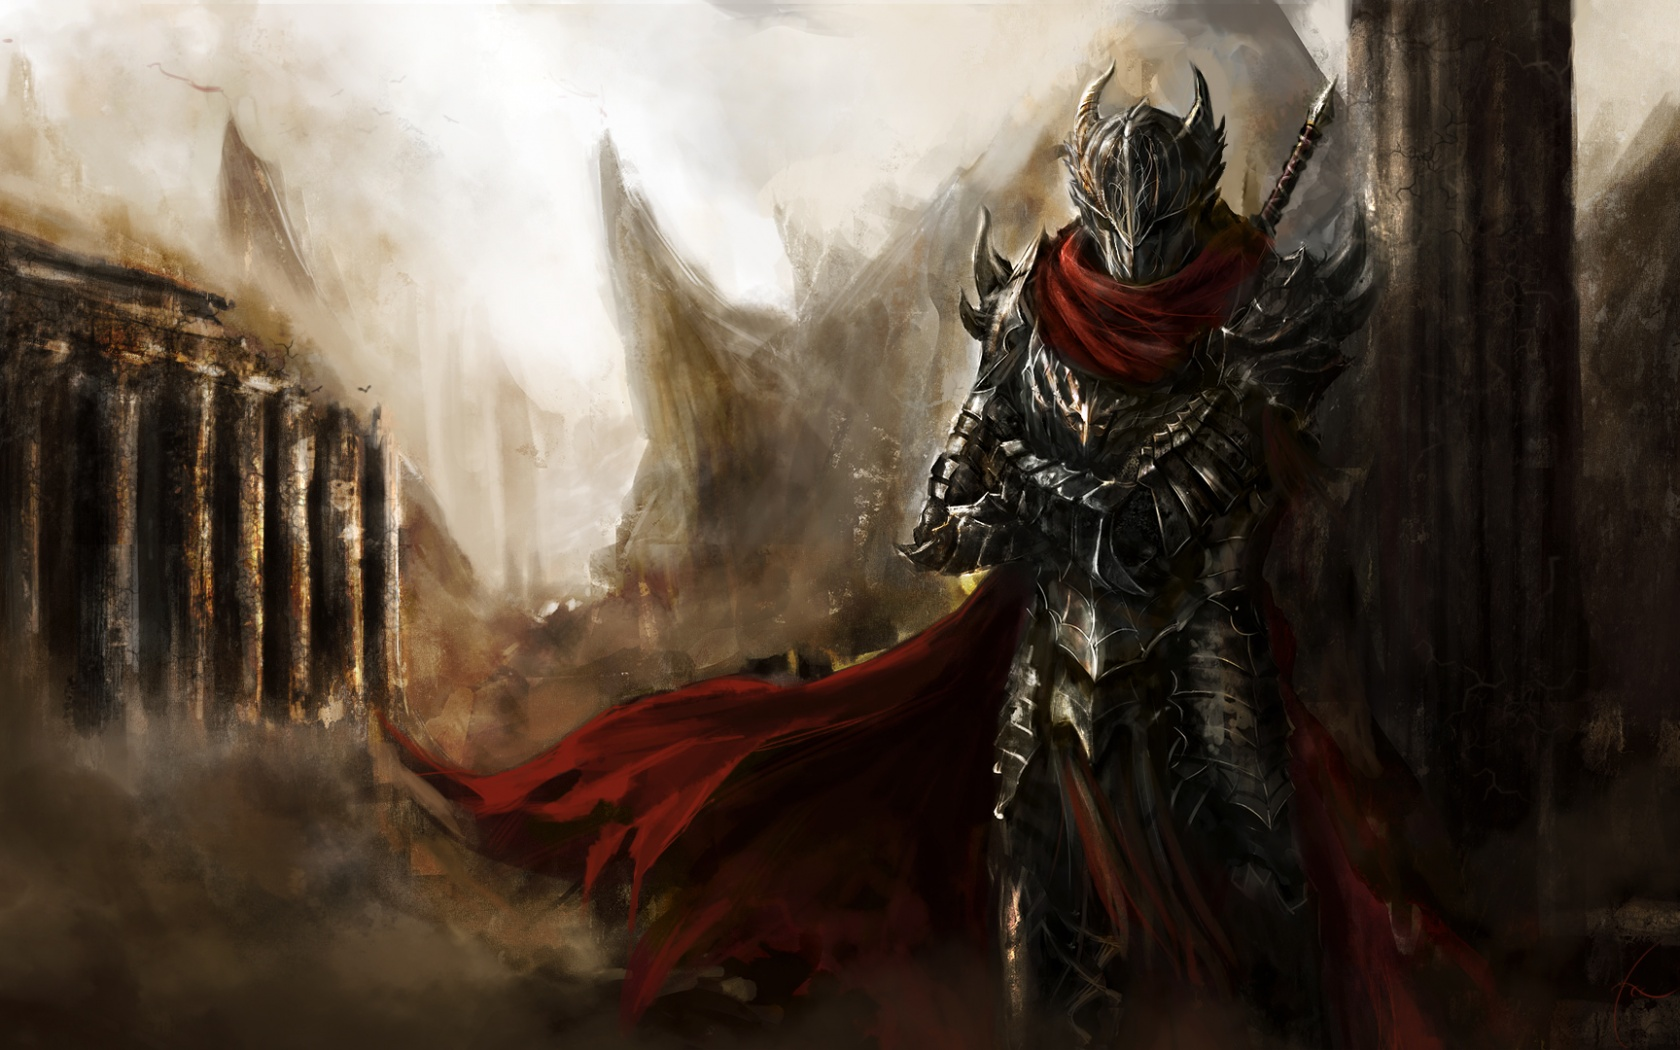 Dark warrior artwork Wallpaper in 1680x1050 Widescreen